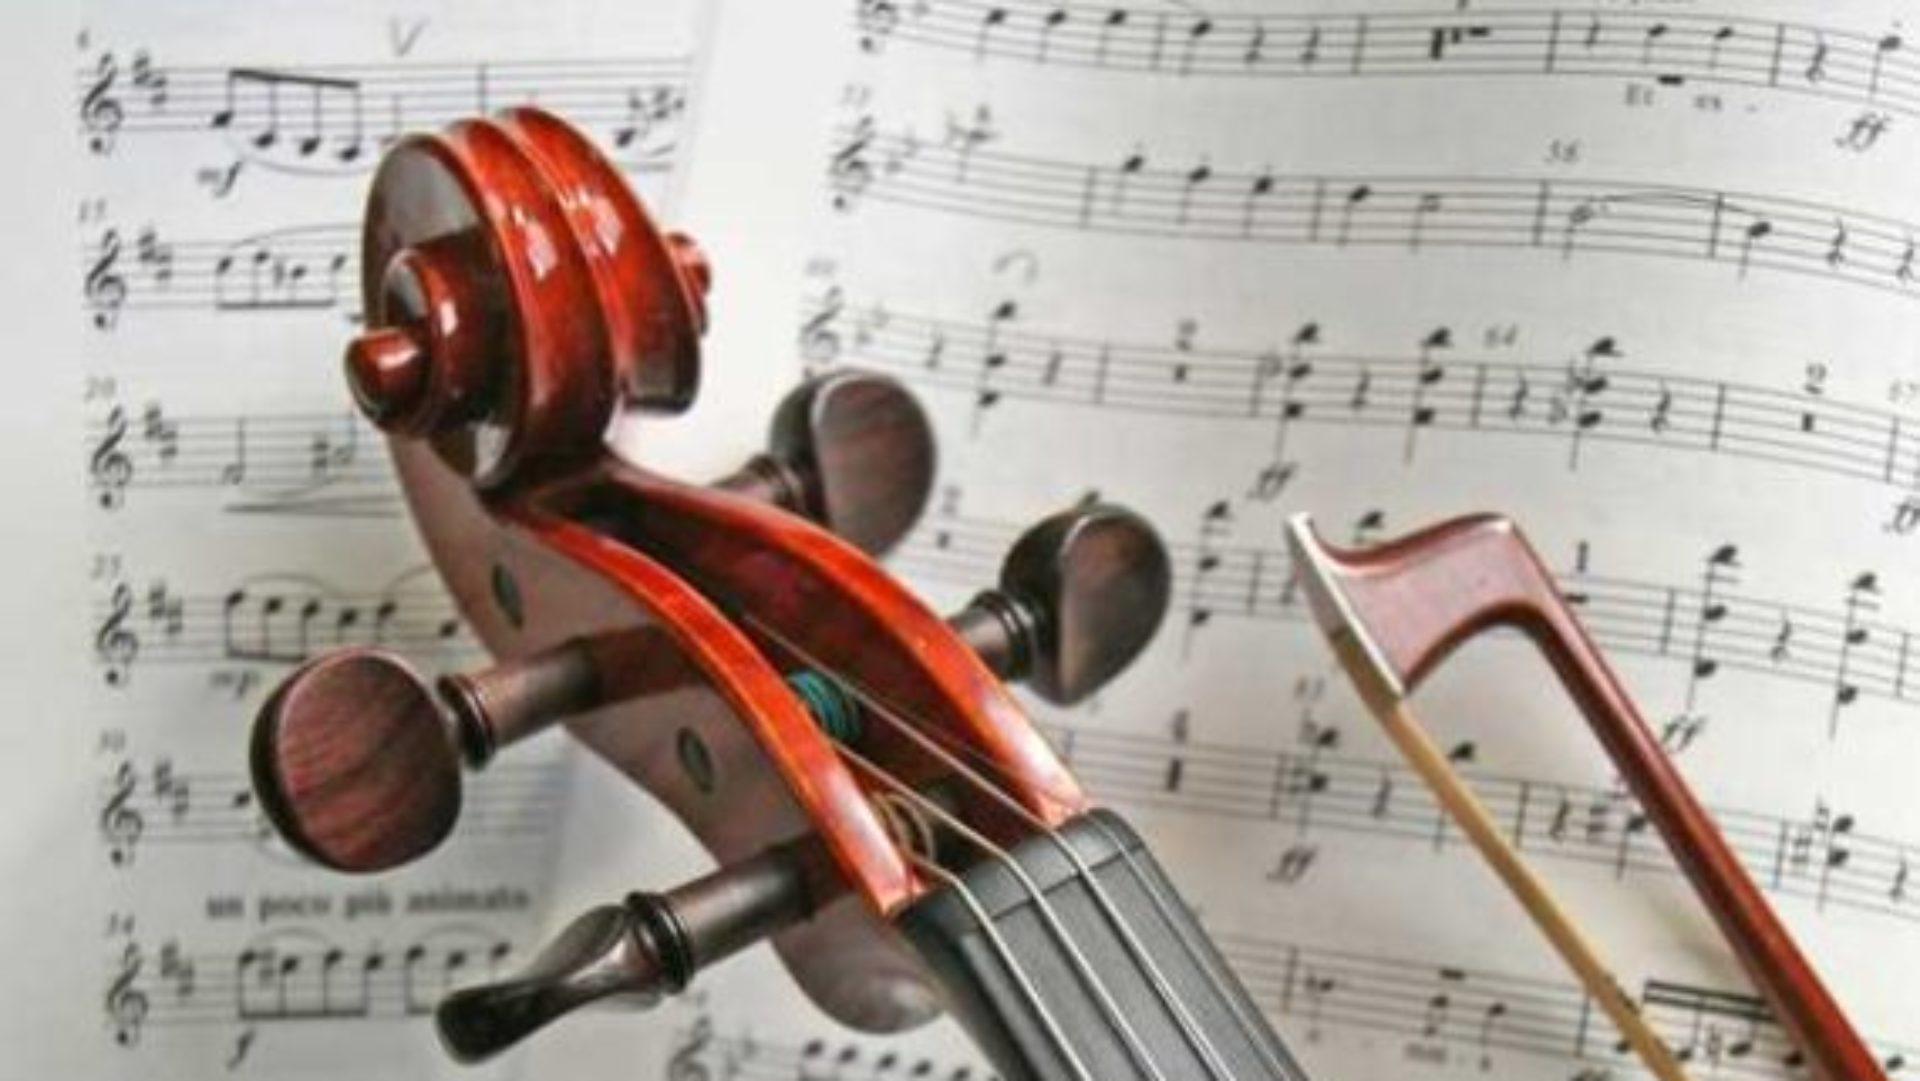 Orchestre de Chambre de Versoix